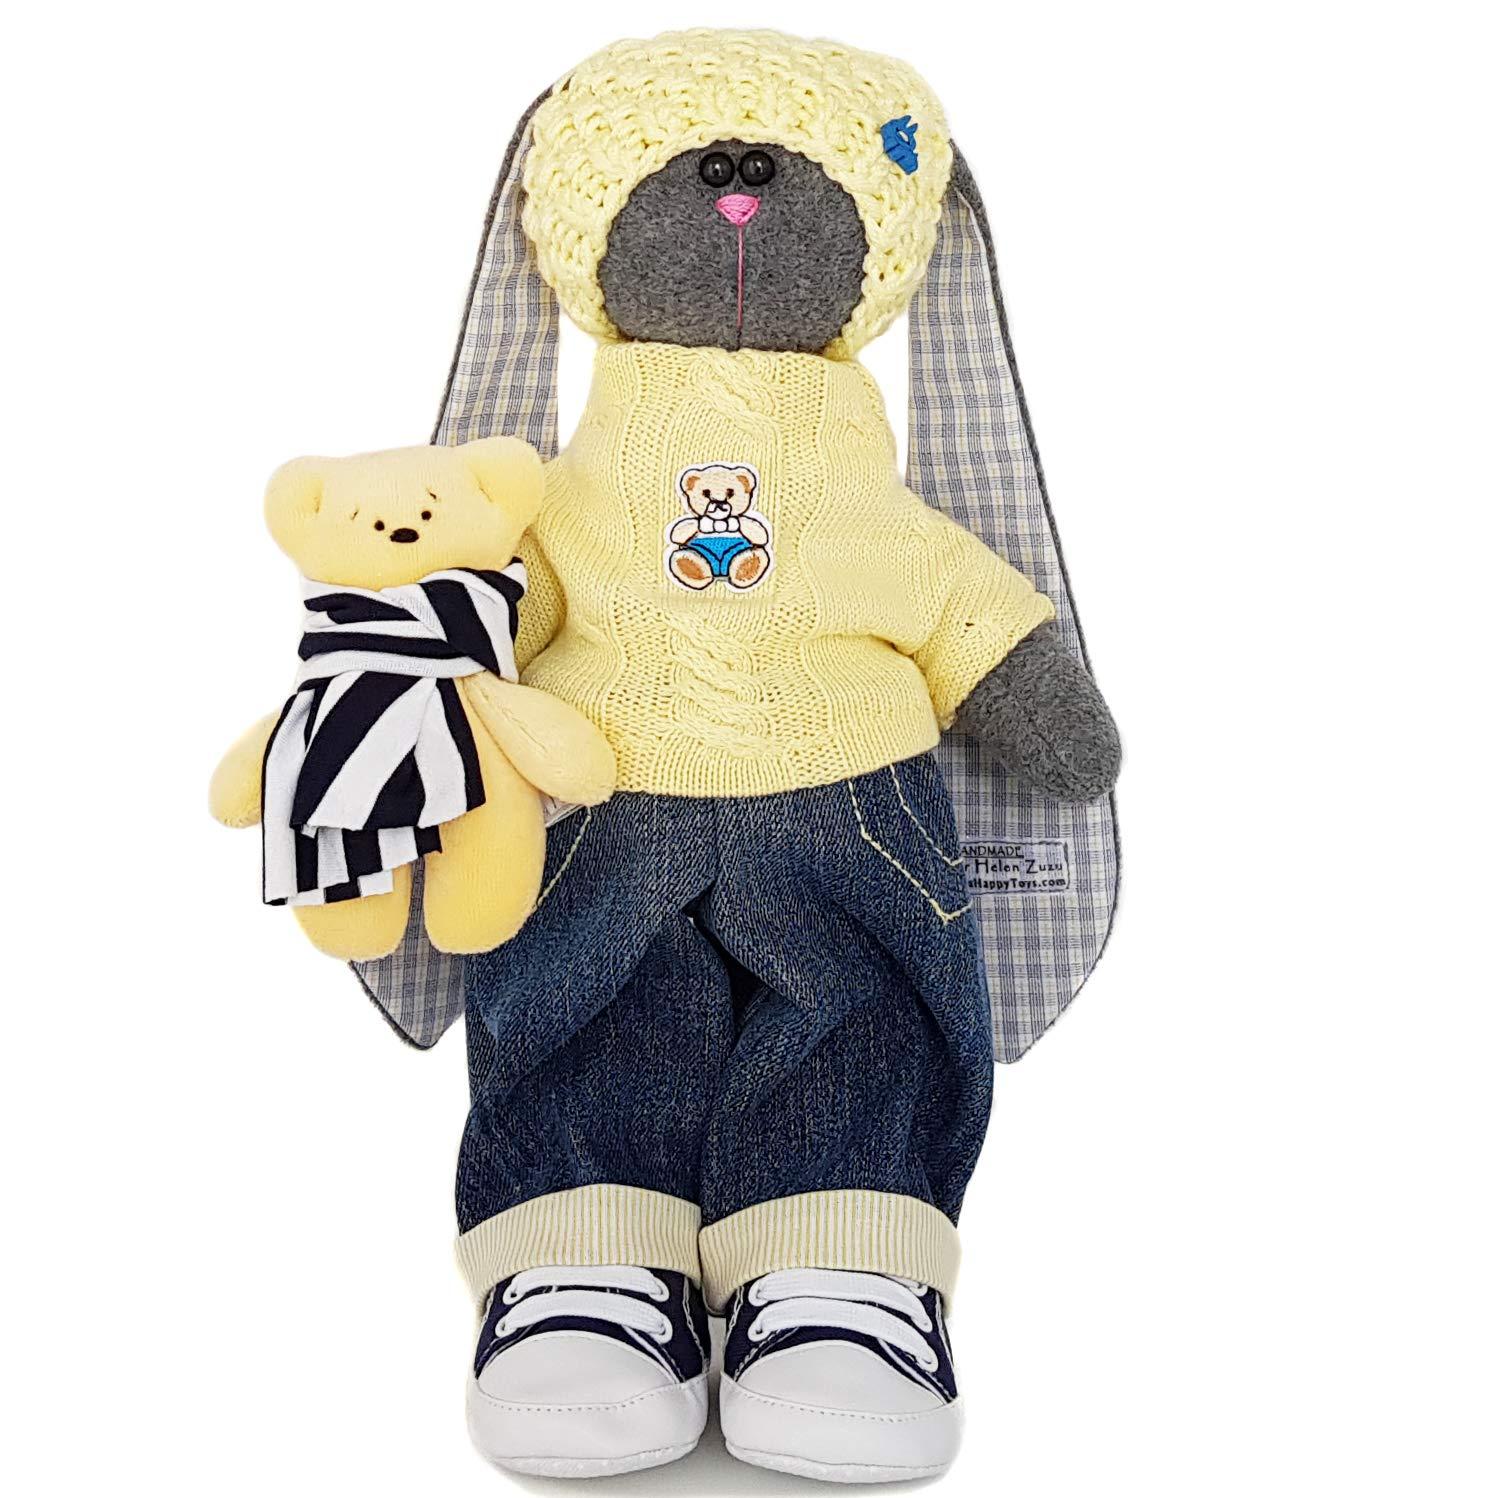 fabric doll Easter bunny handmade Stuffed rabbit 14 inch for boy